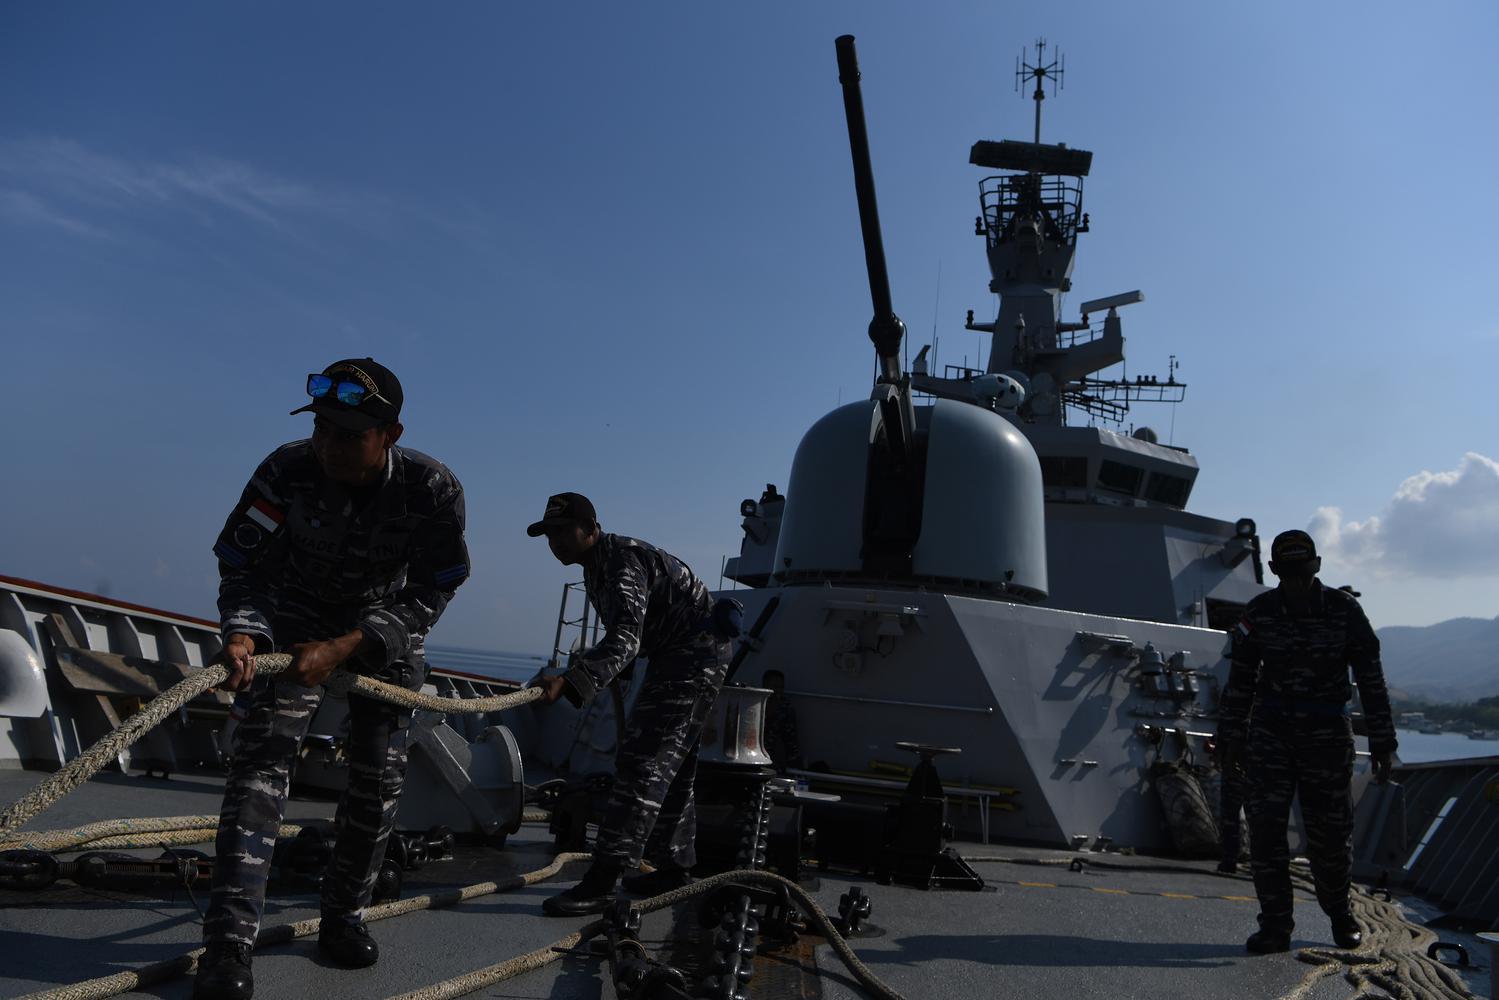 Sejumlah prajurit KRI Usman Harun-359 menarik tali kapal ketika proses sandar di Pelabuhan Dili, Timor Leste, Rabu (11/12/2019). Selama empat hari di Dili akan ada pameran alutista mini seperti pameran senjata dari PT. Pindad serta dari PT. PAL serta akan ada open ship bagi para pejabat dari Timor Leste.